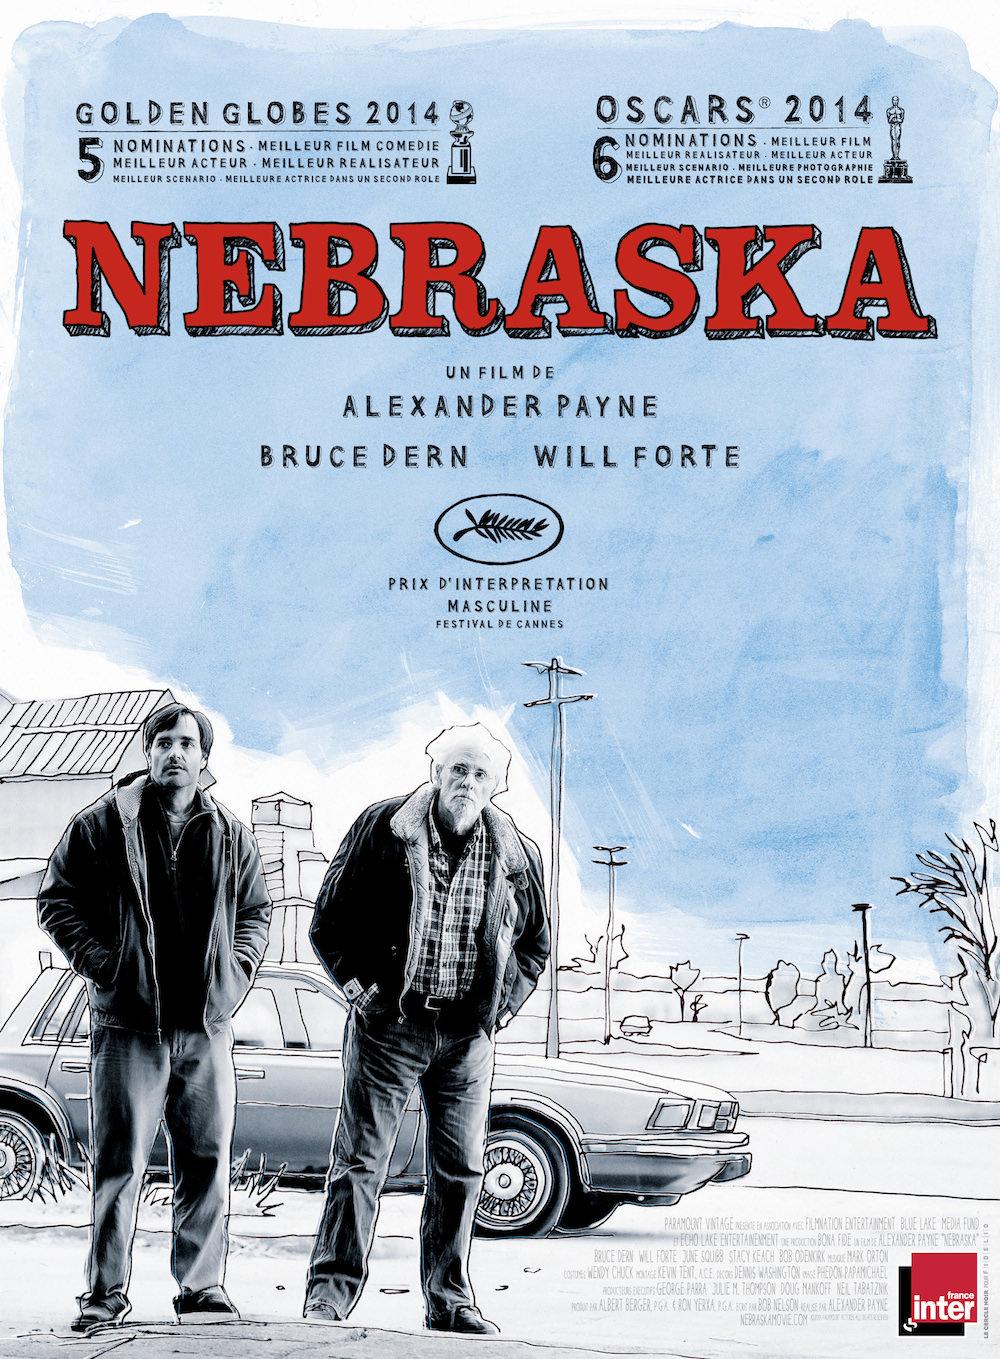 Nebraska payne